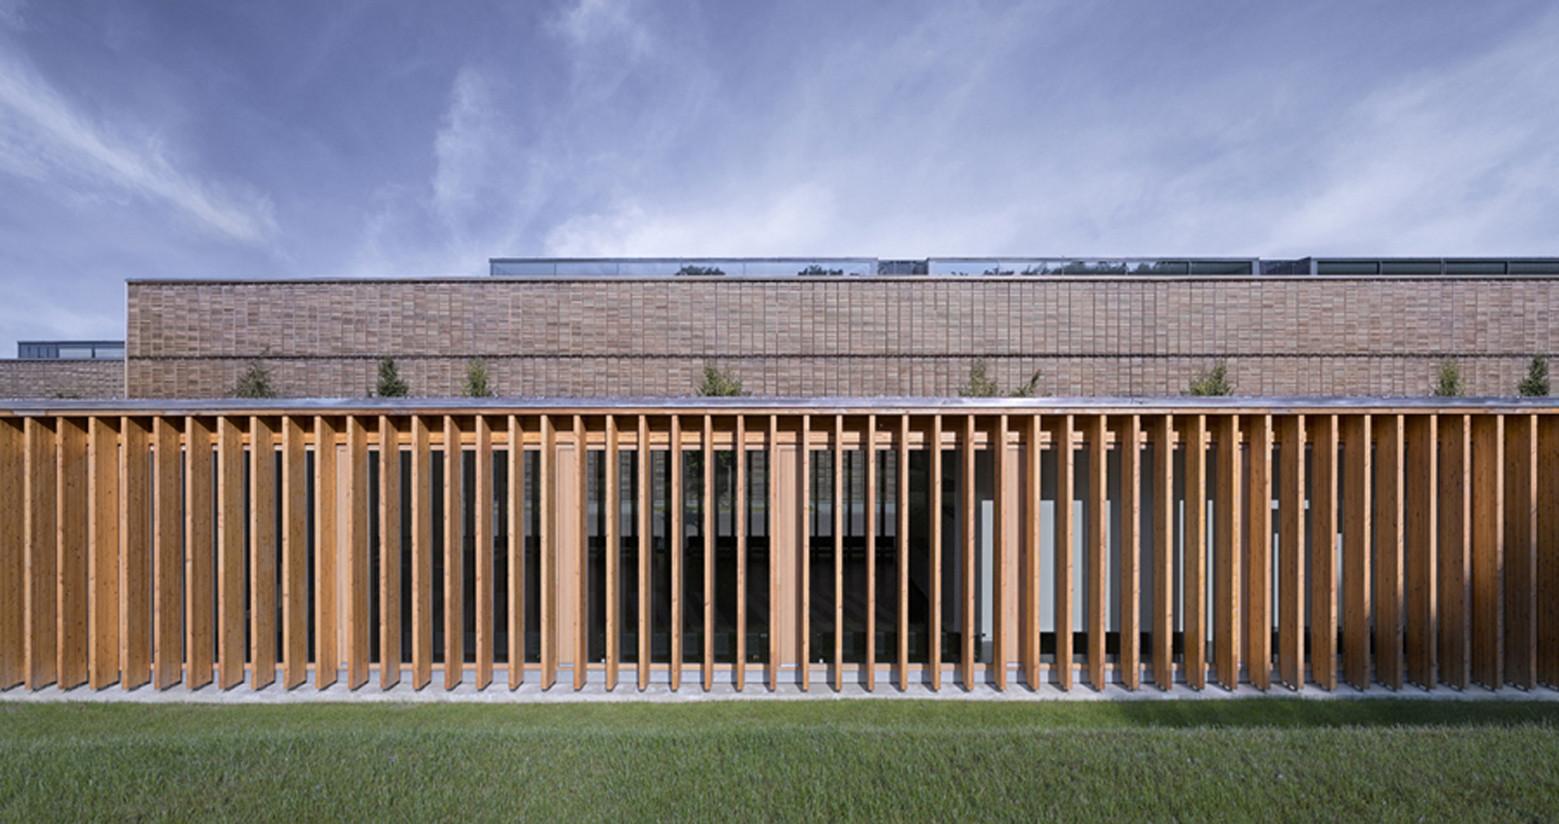 Gallery of cafeteria at the university aalen mgf architekten 8 - Mgf architekten ...